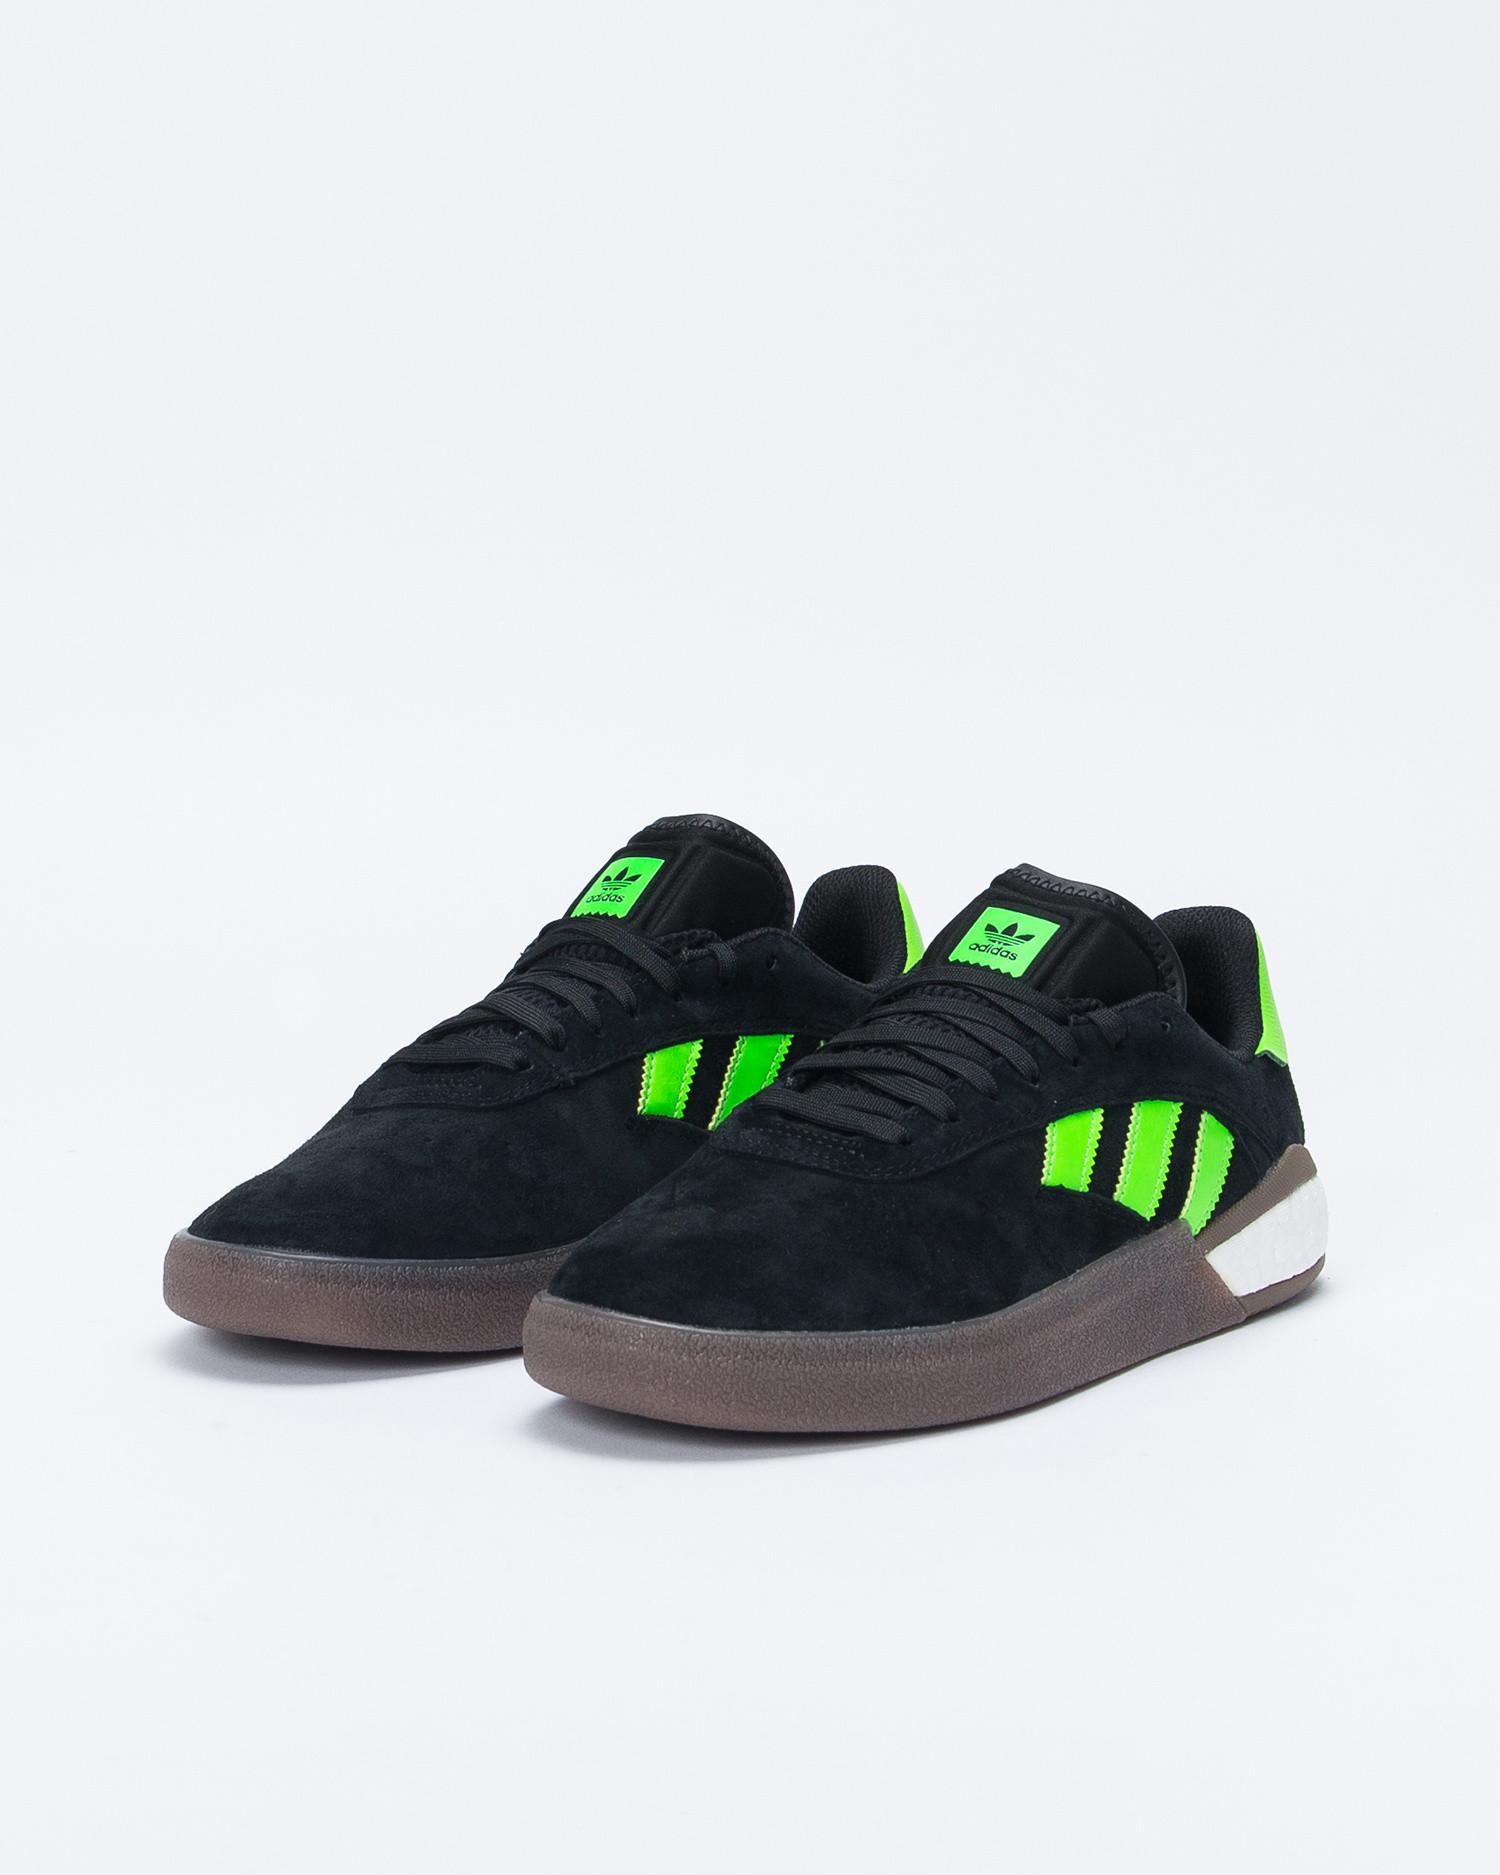 adidas 3st.004 Cblack/Ftwwht/Gum5